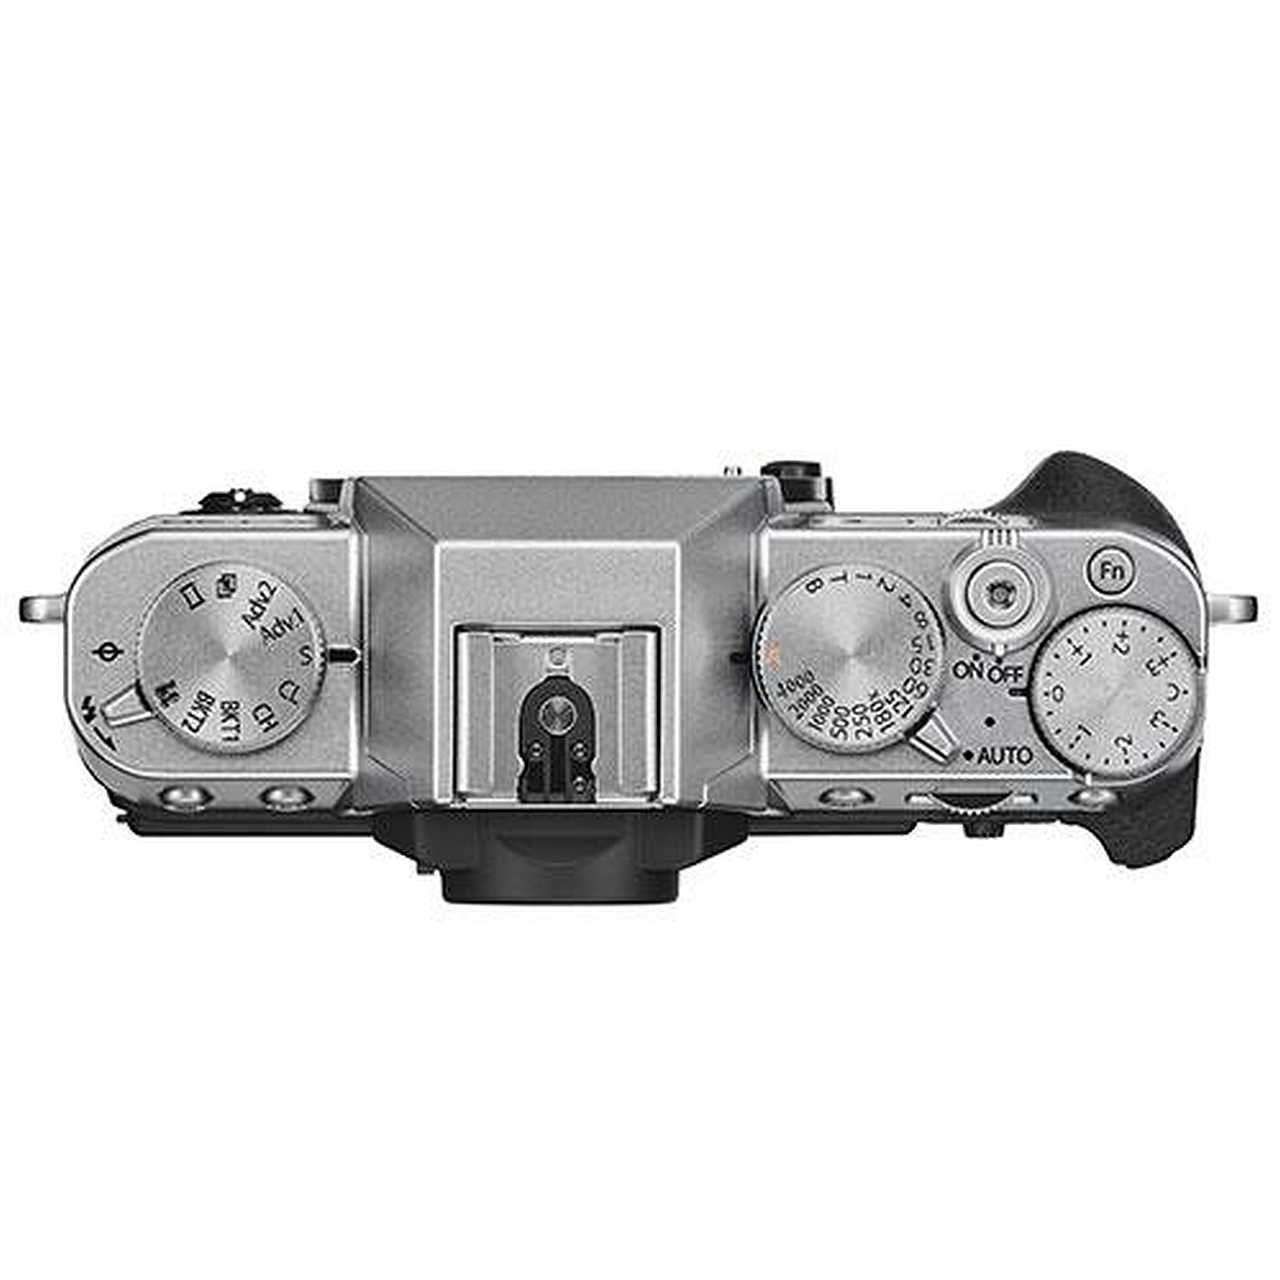 Fujifilm X-T30 top view